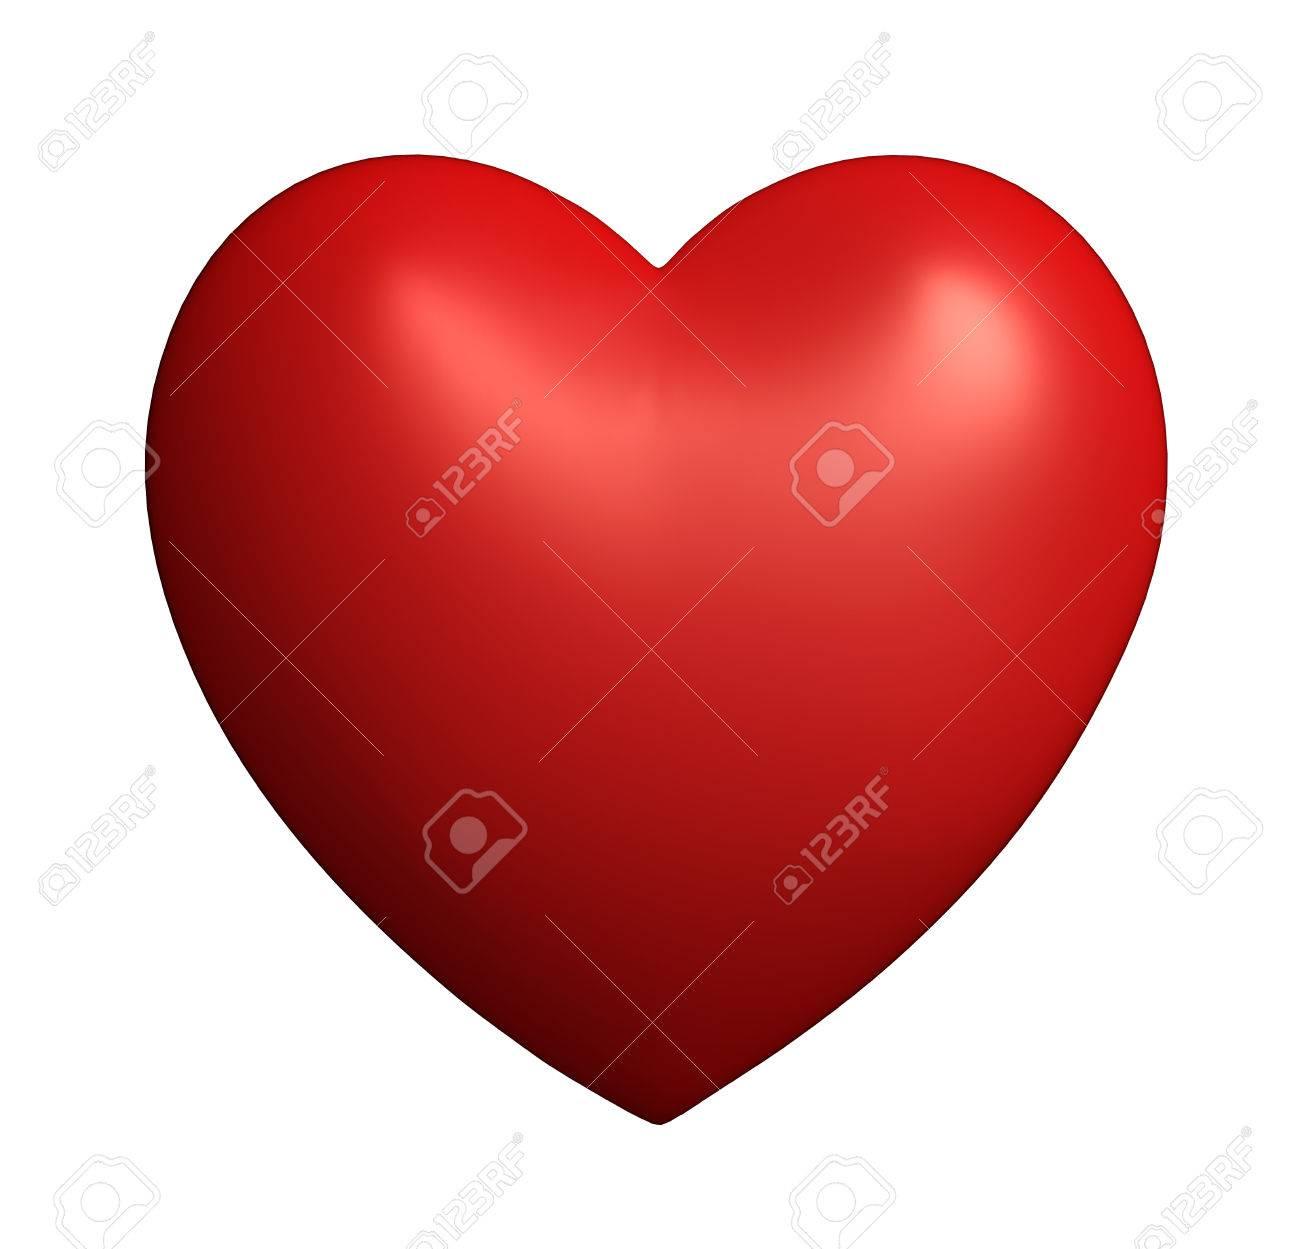 Beautiful pictures of love symbols impremedia heart shape classic beautiful love symbol stock photo 30011143 biocorpaavc Image collections